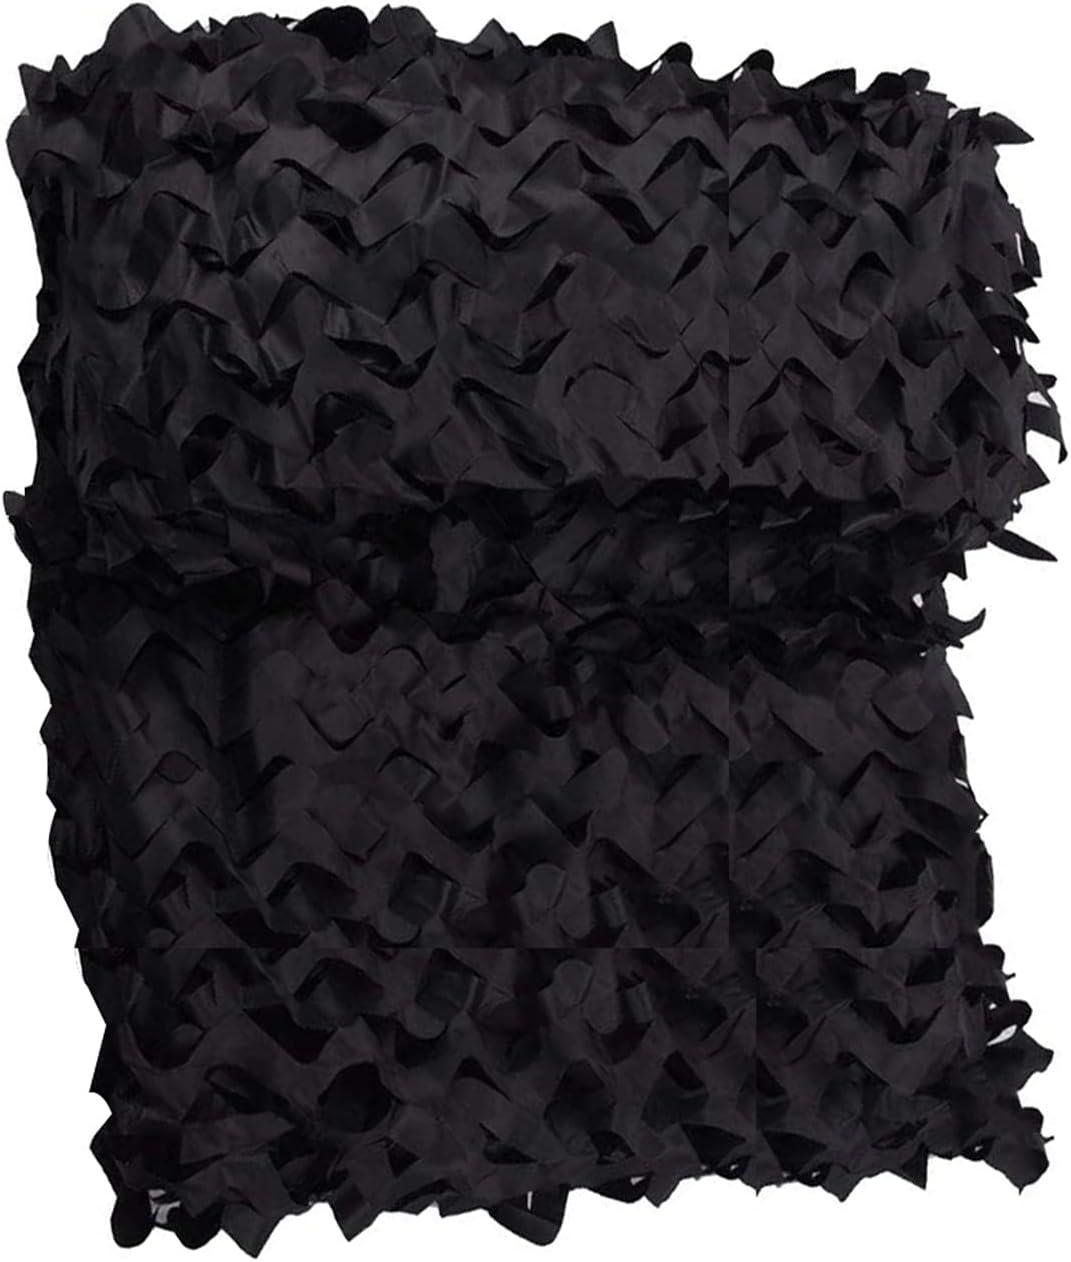 SENYUAN Camo Netting Camouflage overseas Elegant Net or Covers Military Blind